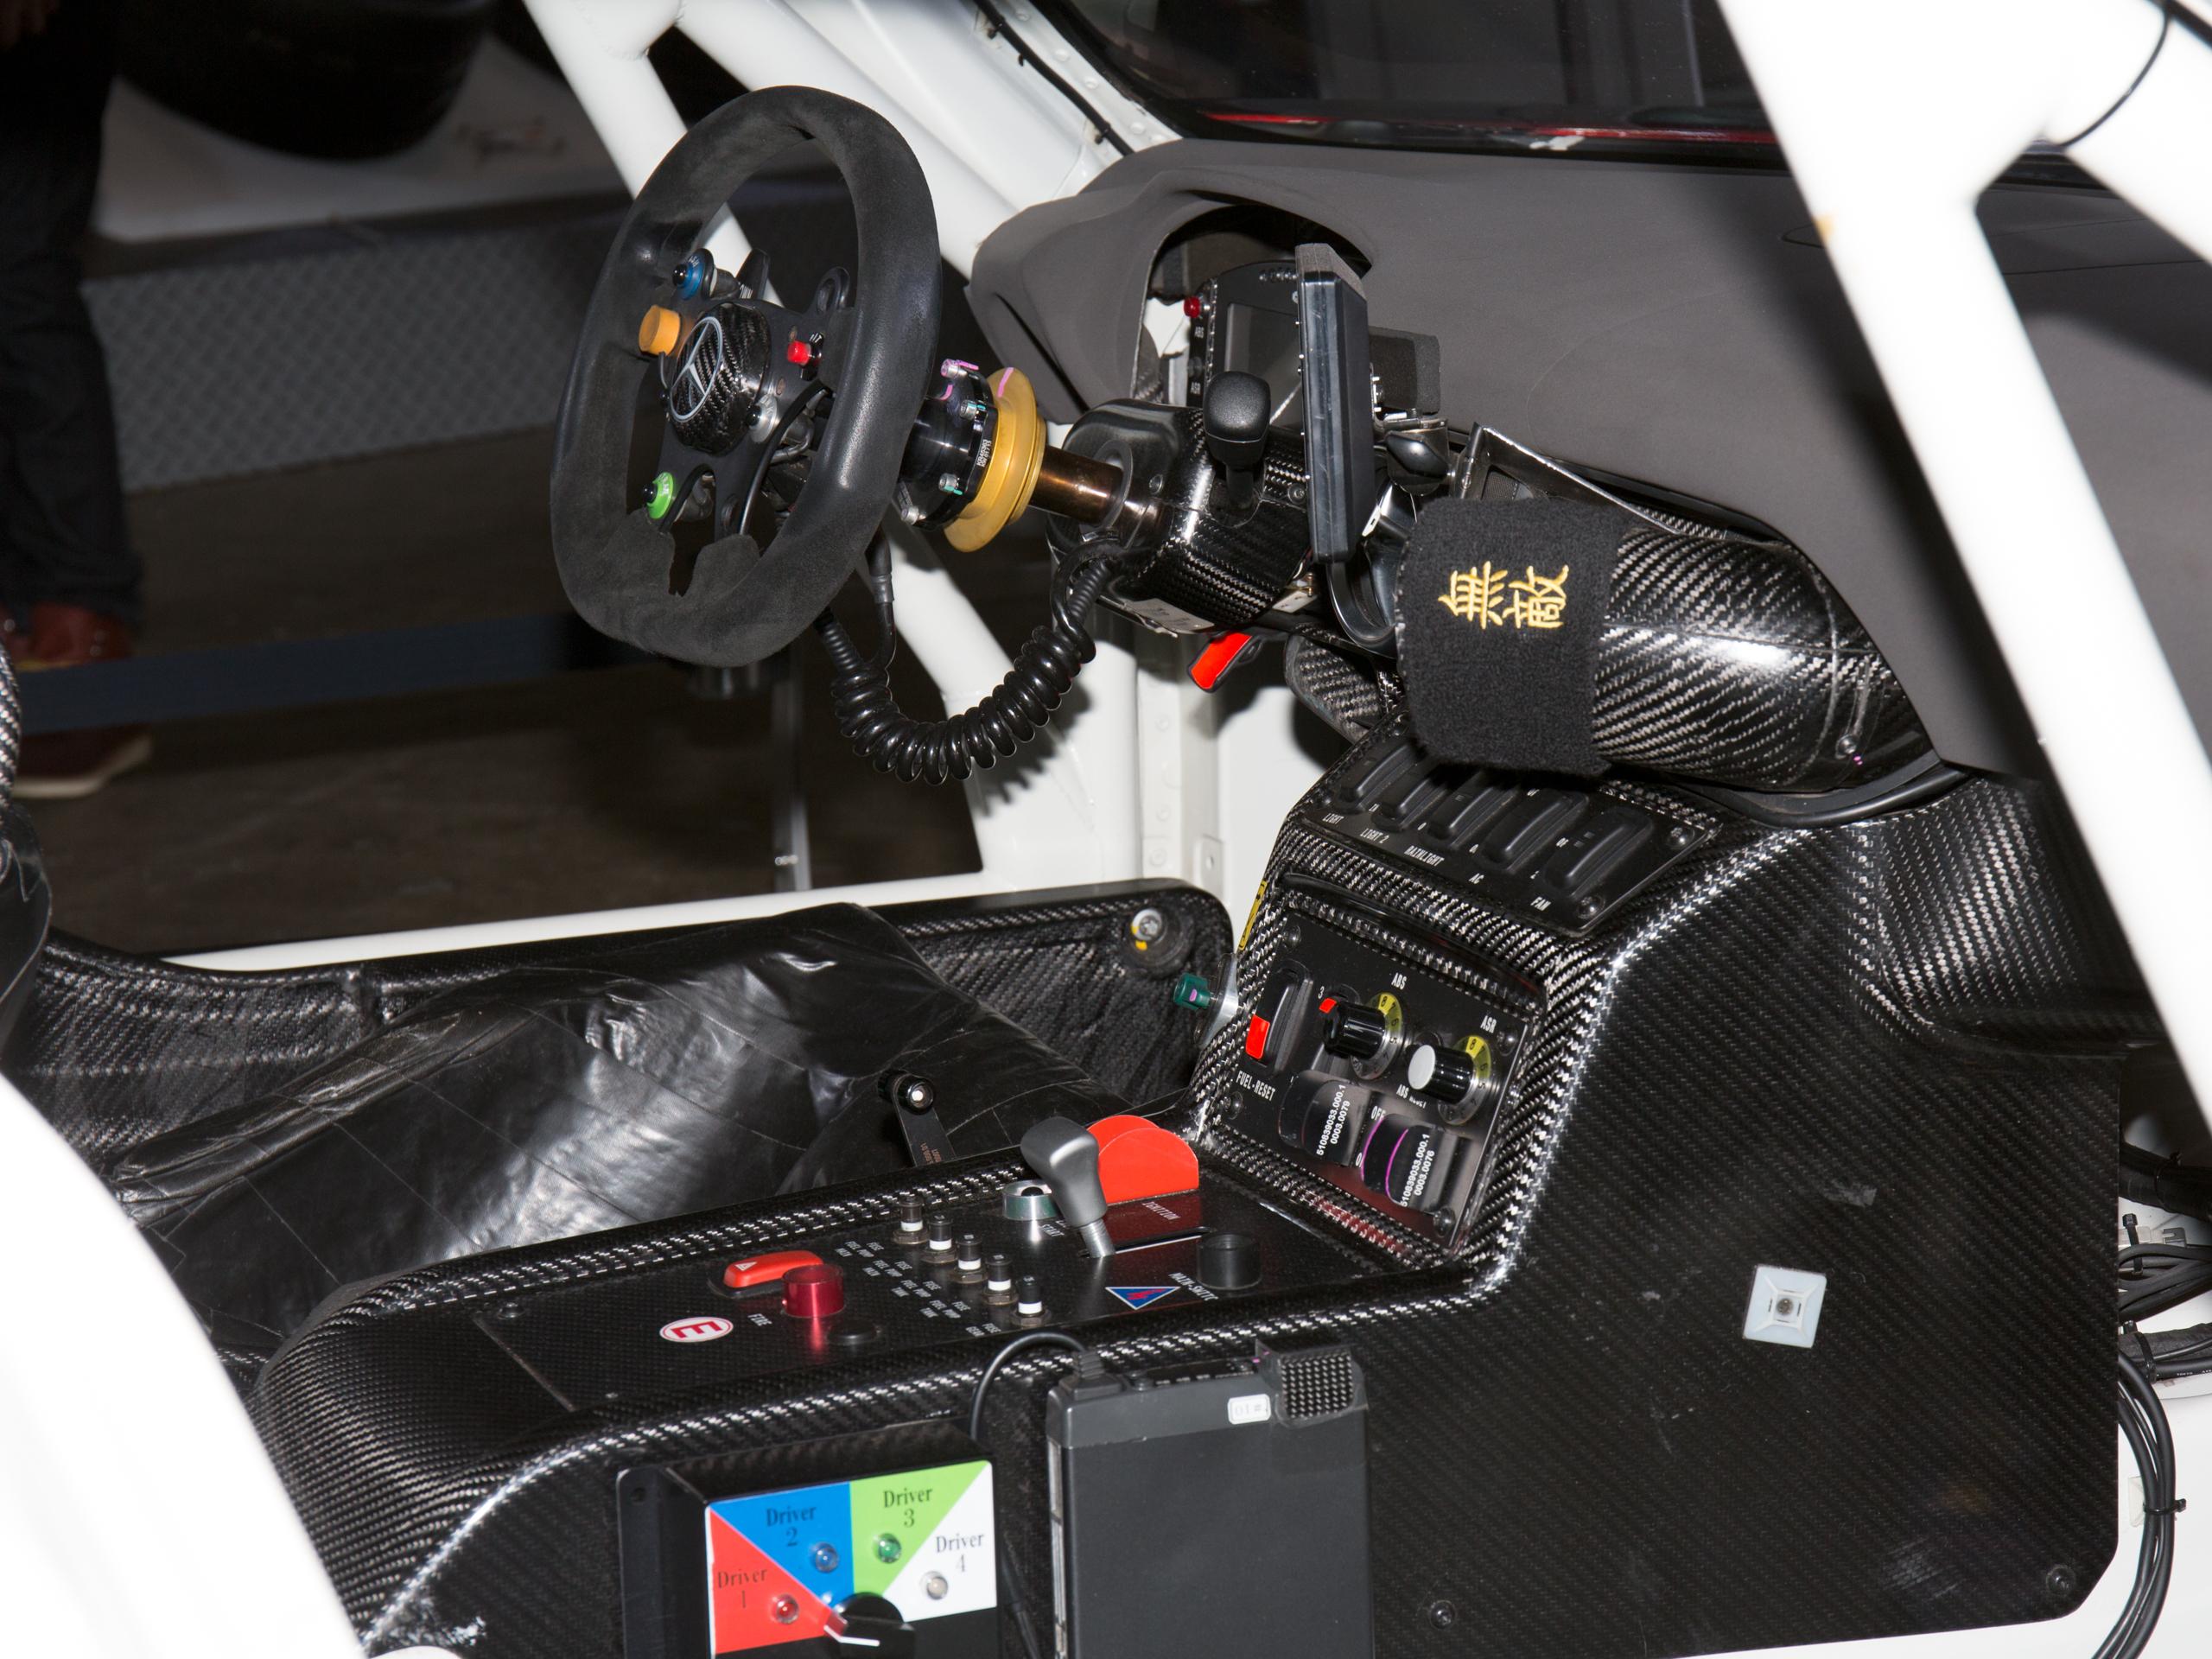 Auto cockpit mercedes  File:Mercedes-Benz SLS AMG GT3 cockpit 2015 Tokyo Auto Salon.jpg ...